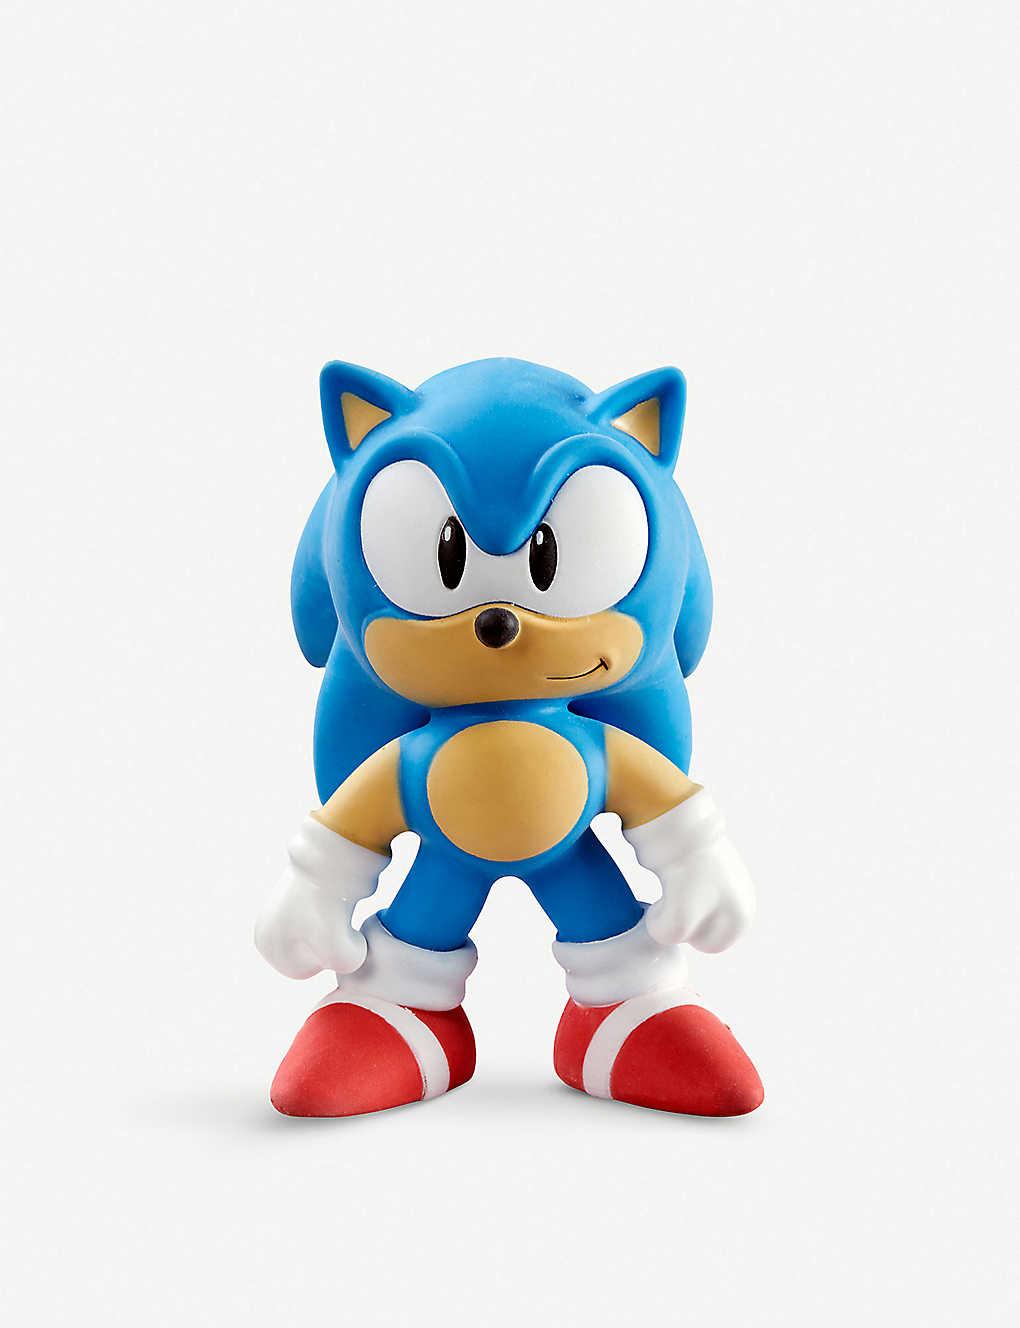 new product 5479d 66464 POCKET MONEY Mini Stretch Sonic The Hedgehog